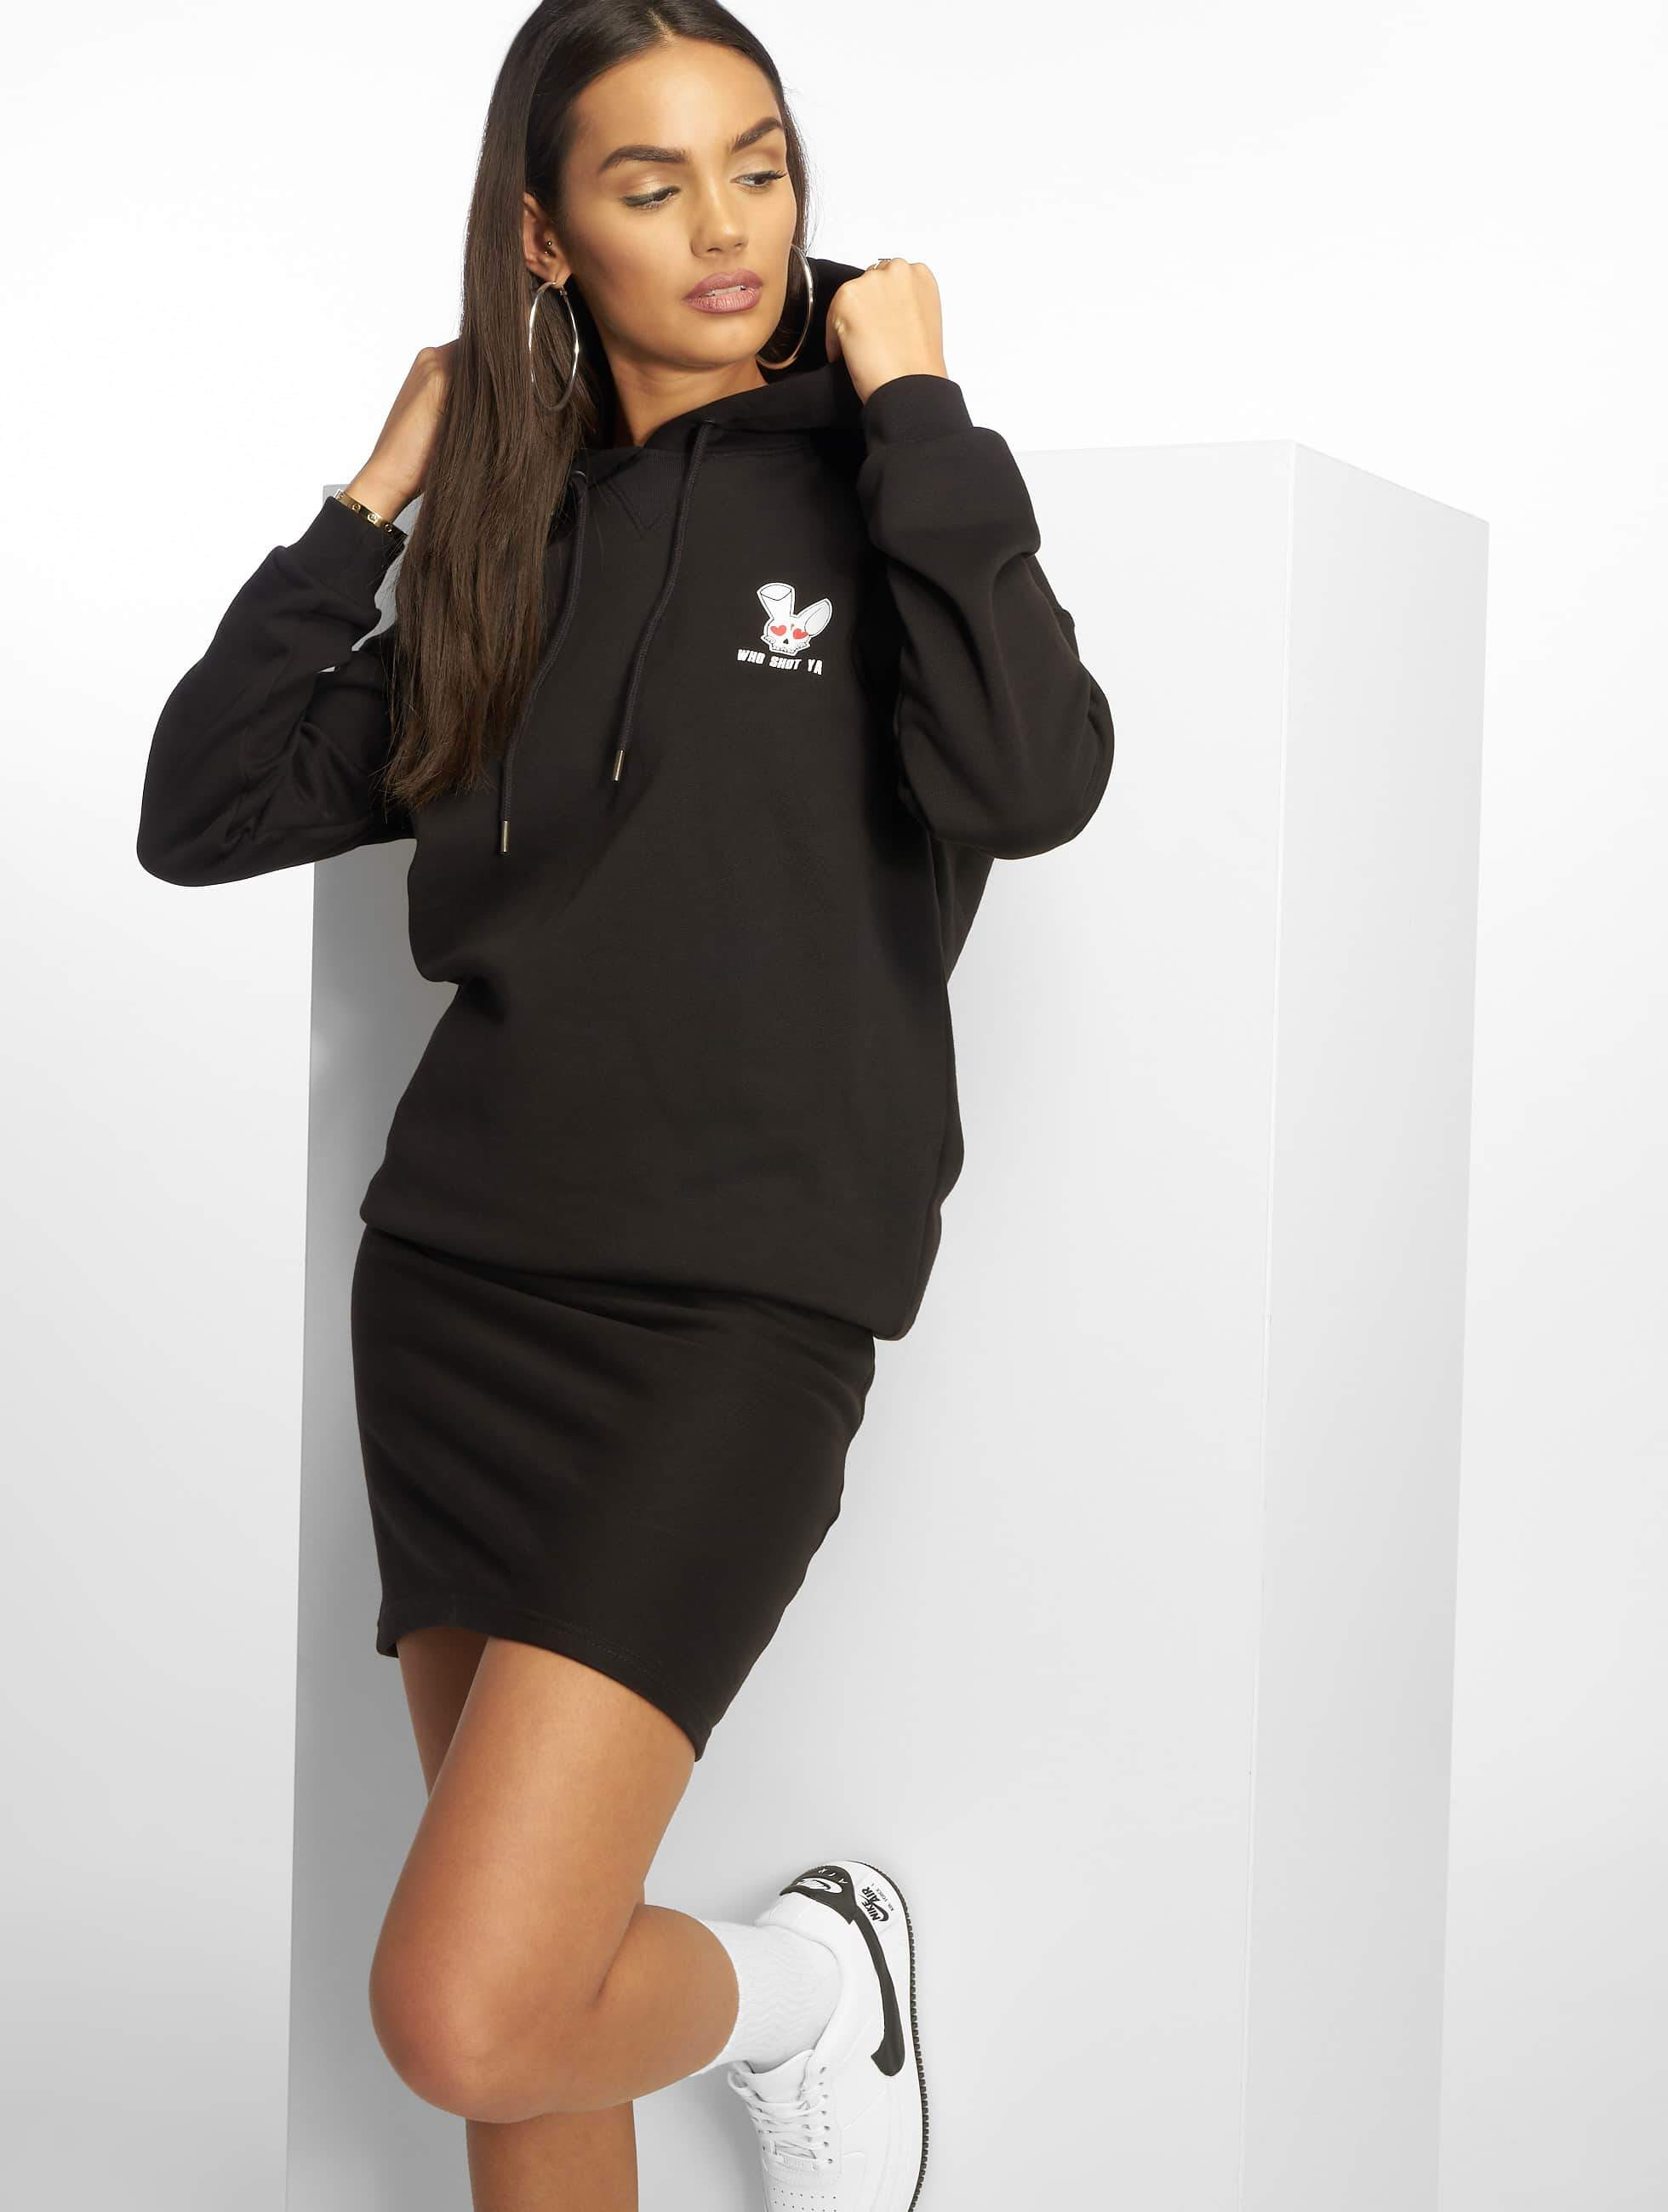 Who Shot Ya? / Dress Missy Menace in black L